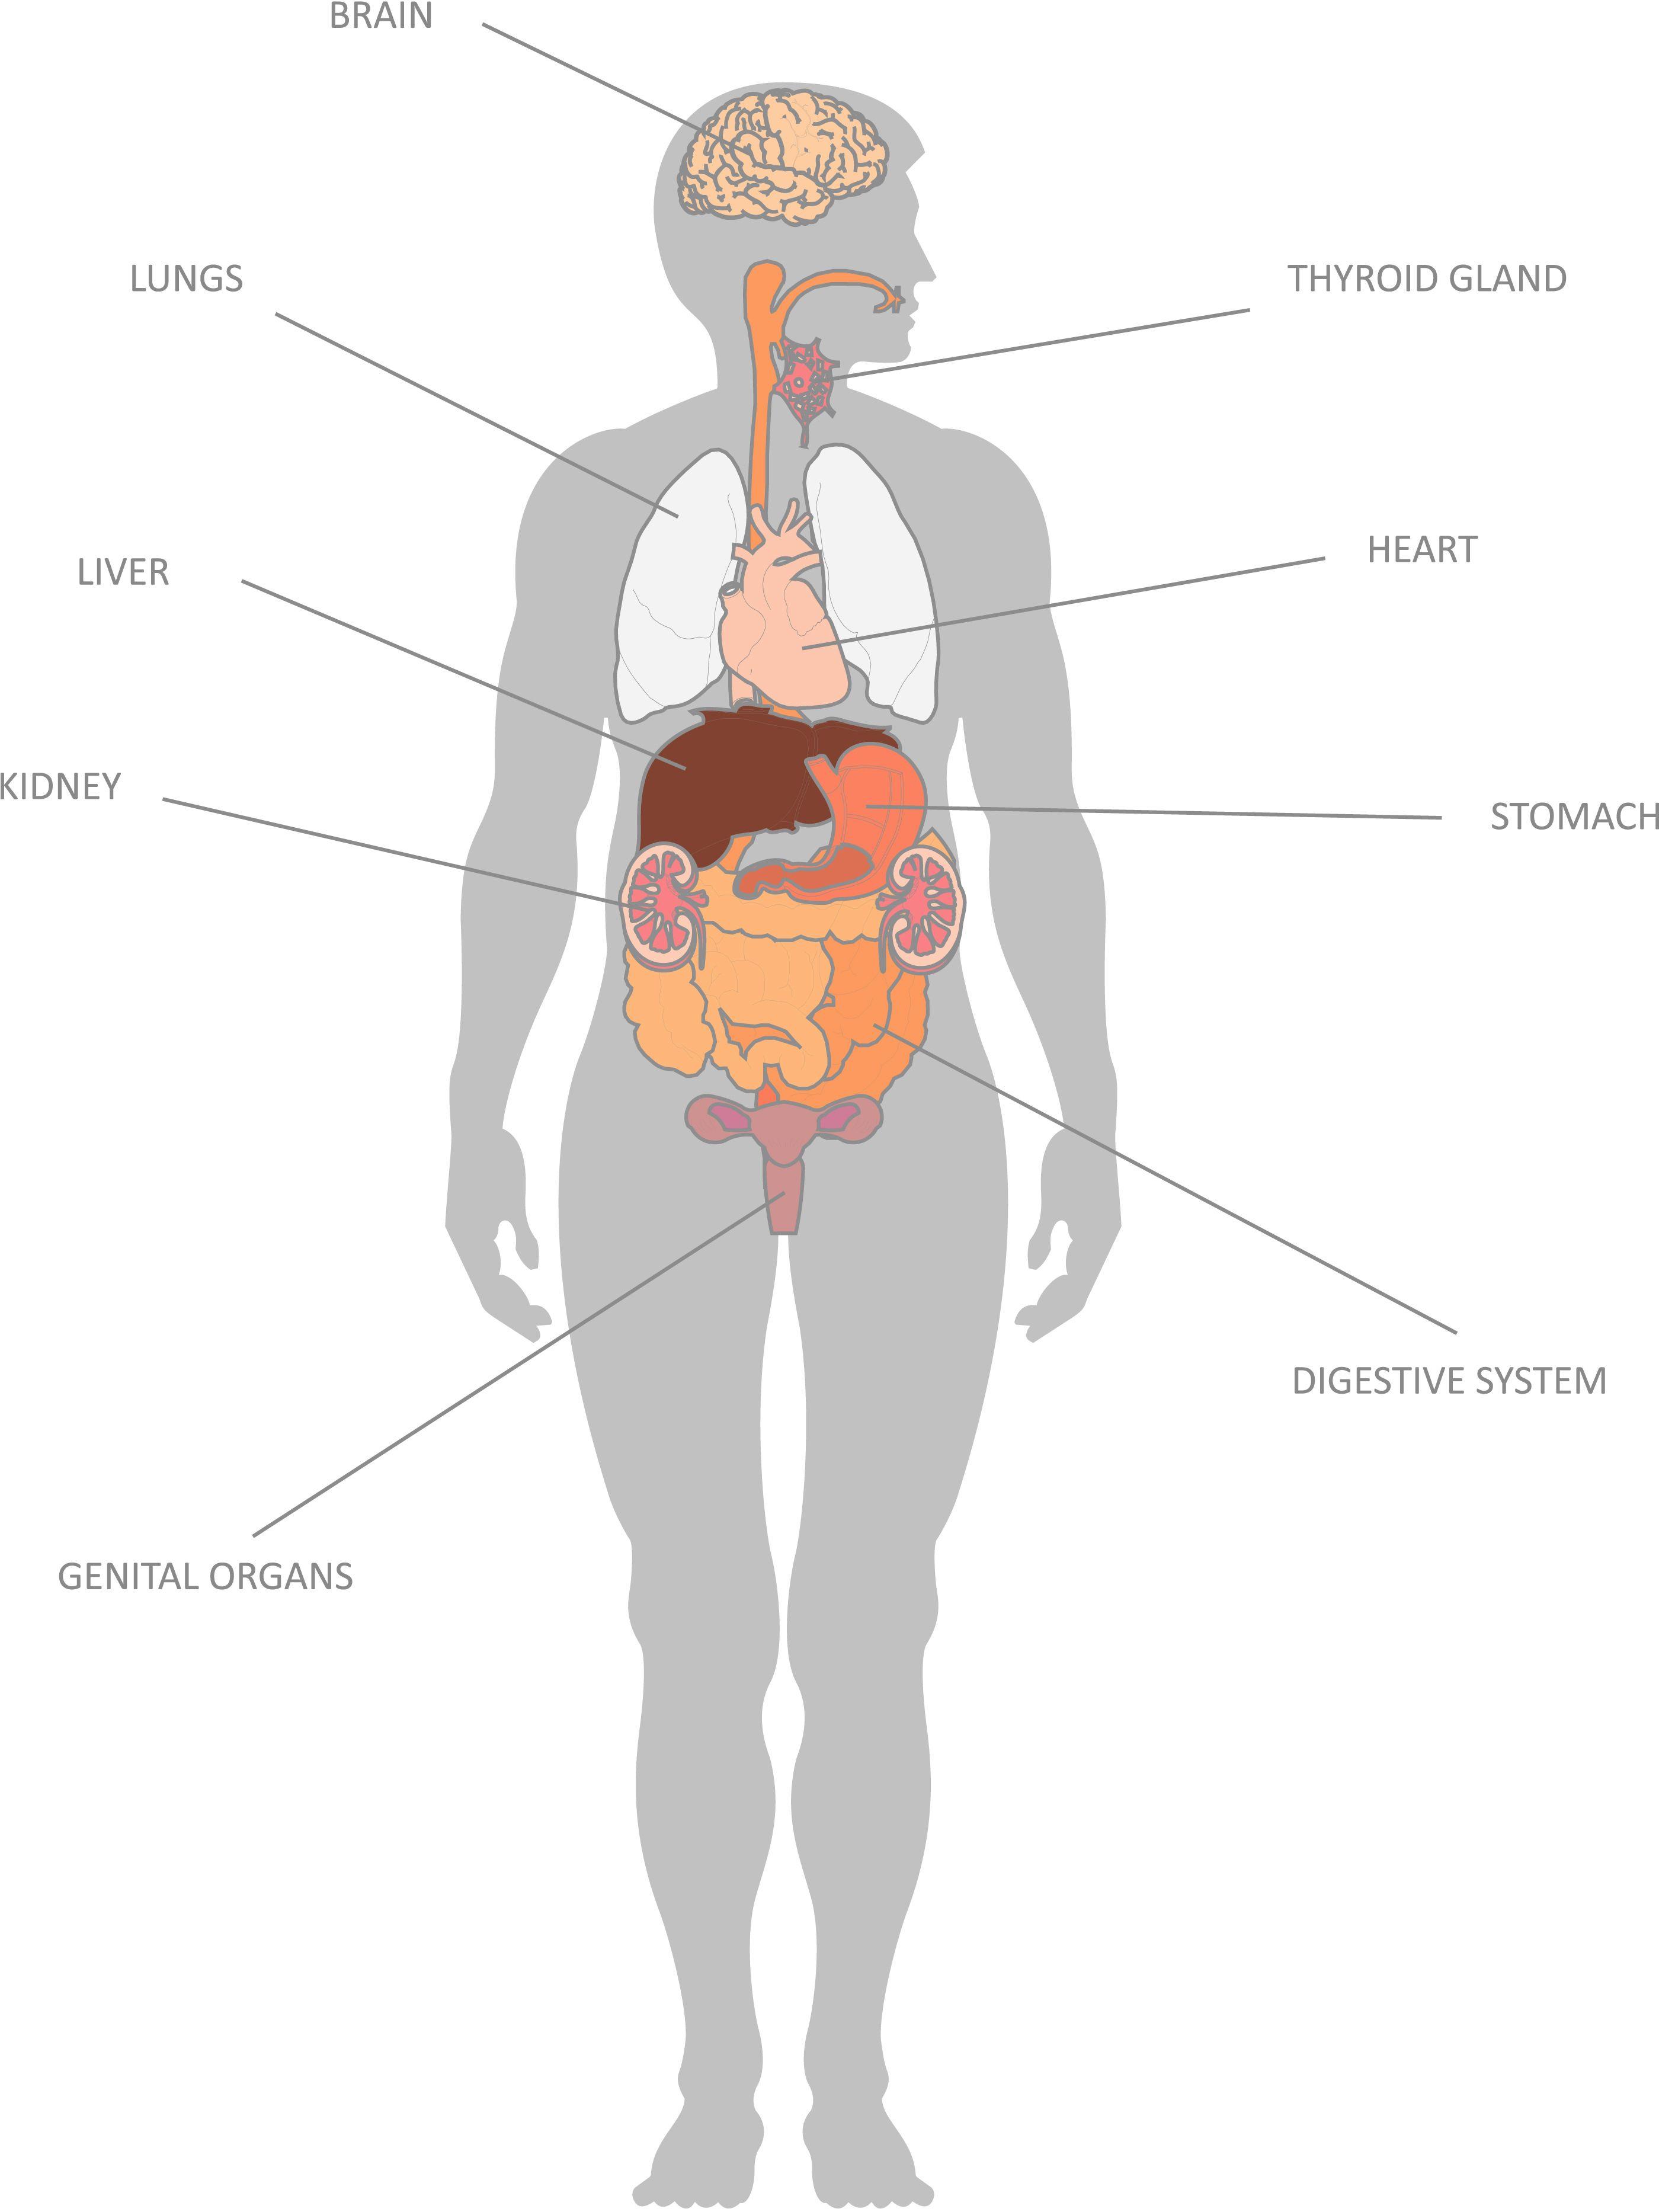 Having Map Of Internal Organs To Understand Human Body